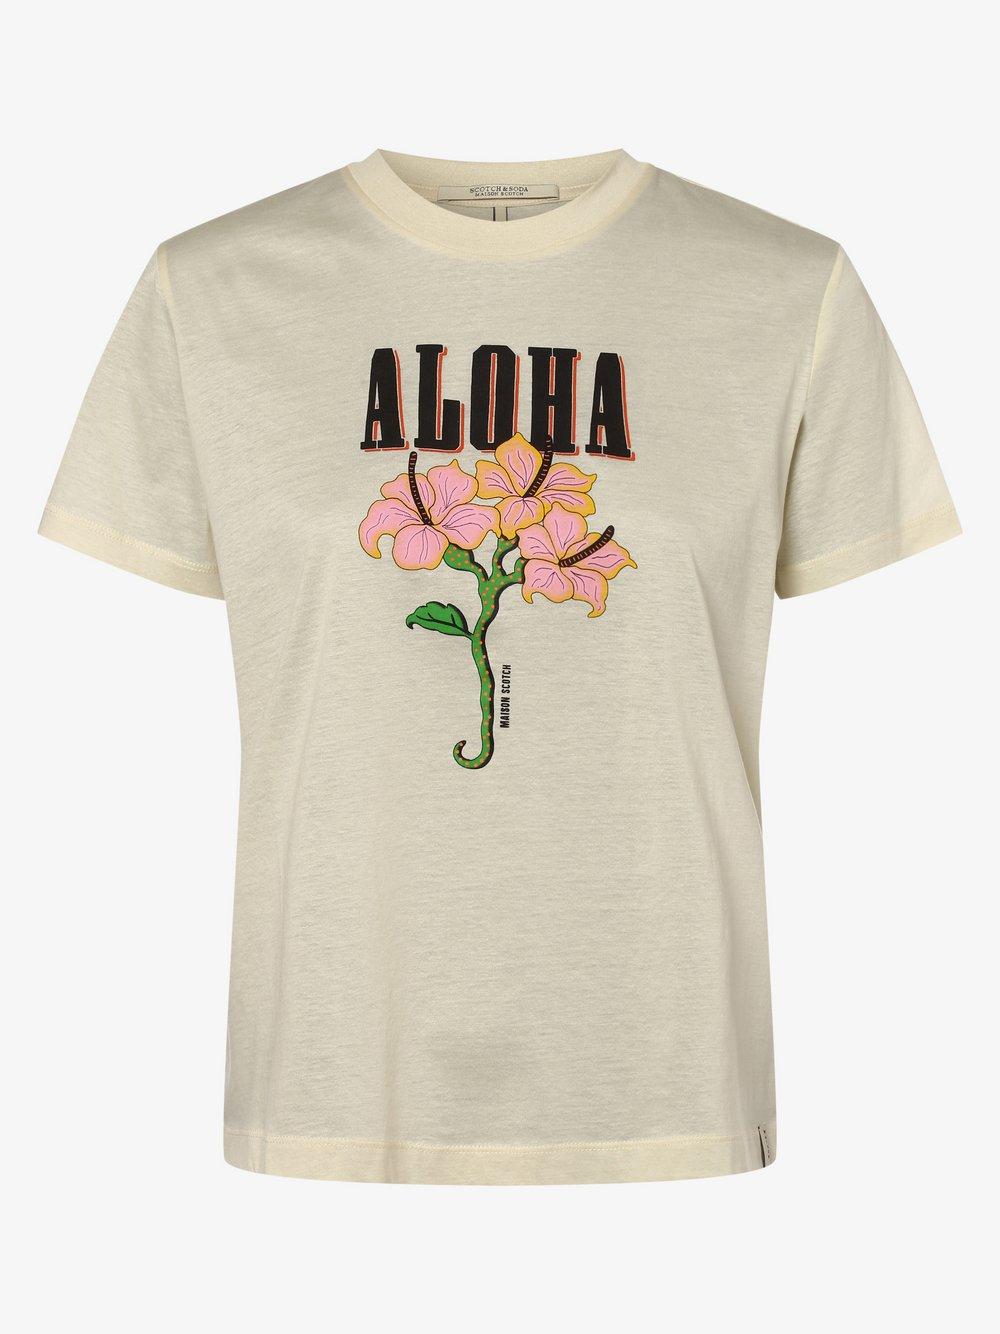 Scotch & Soda - T-shirt damski, beżowy